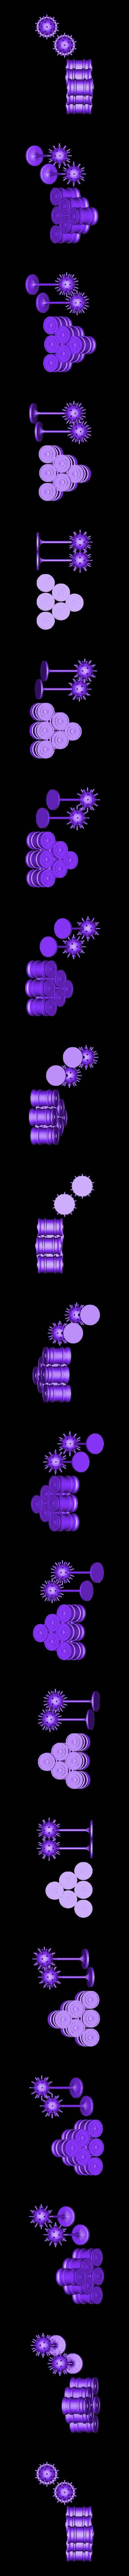 submarine-huntingf-set.stl Download free STL file submarine hunting set • 3D printing design, syzguru11